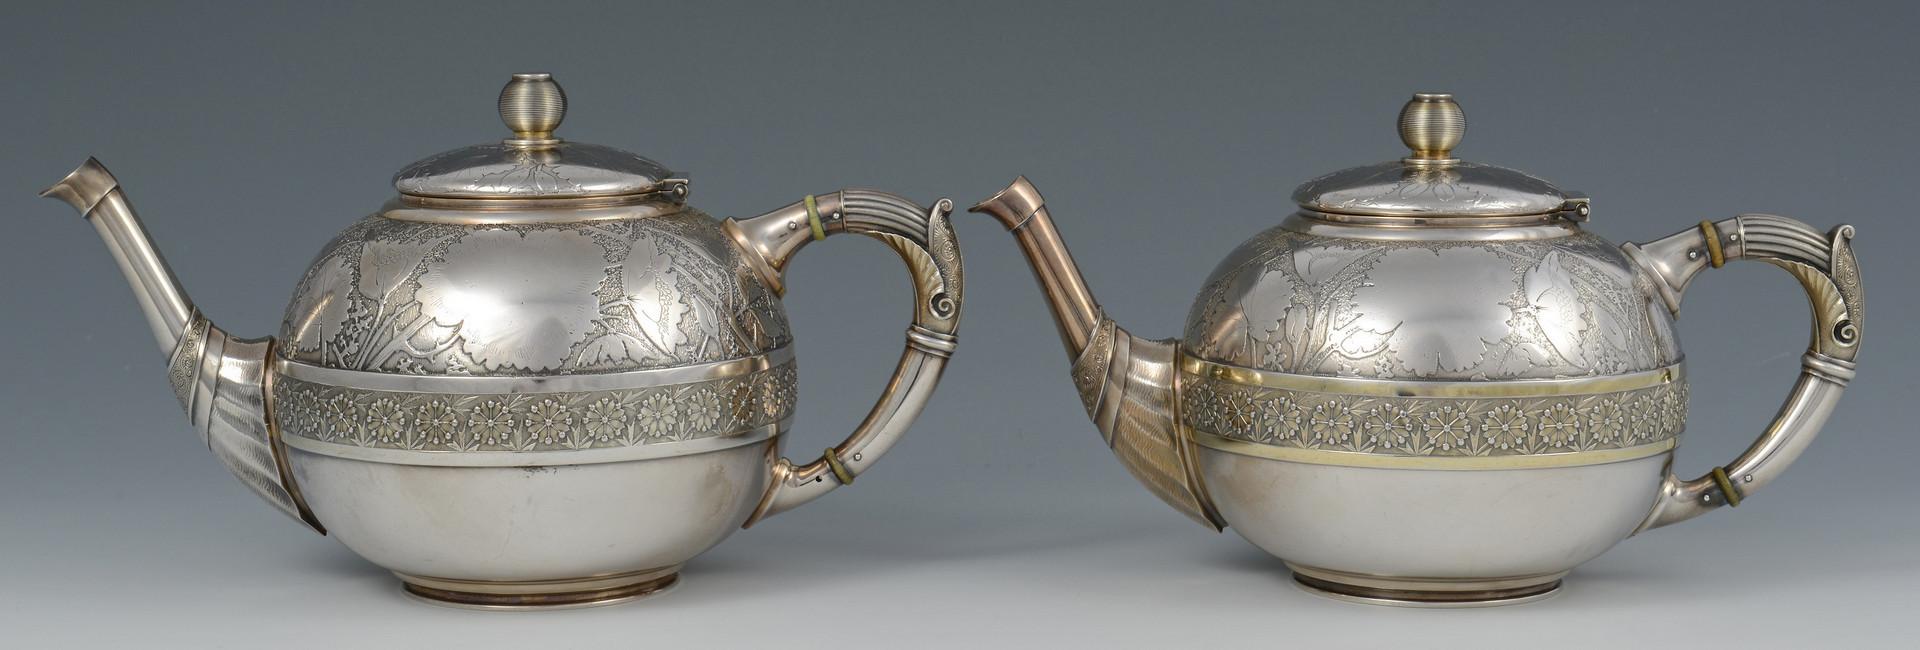 Lot 28: Wood & Hughes Aesthetic Tea Set